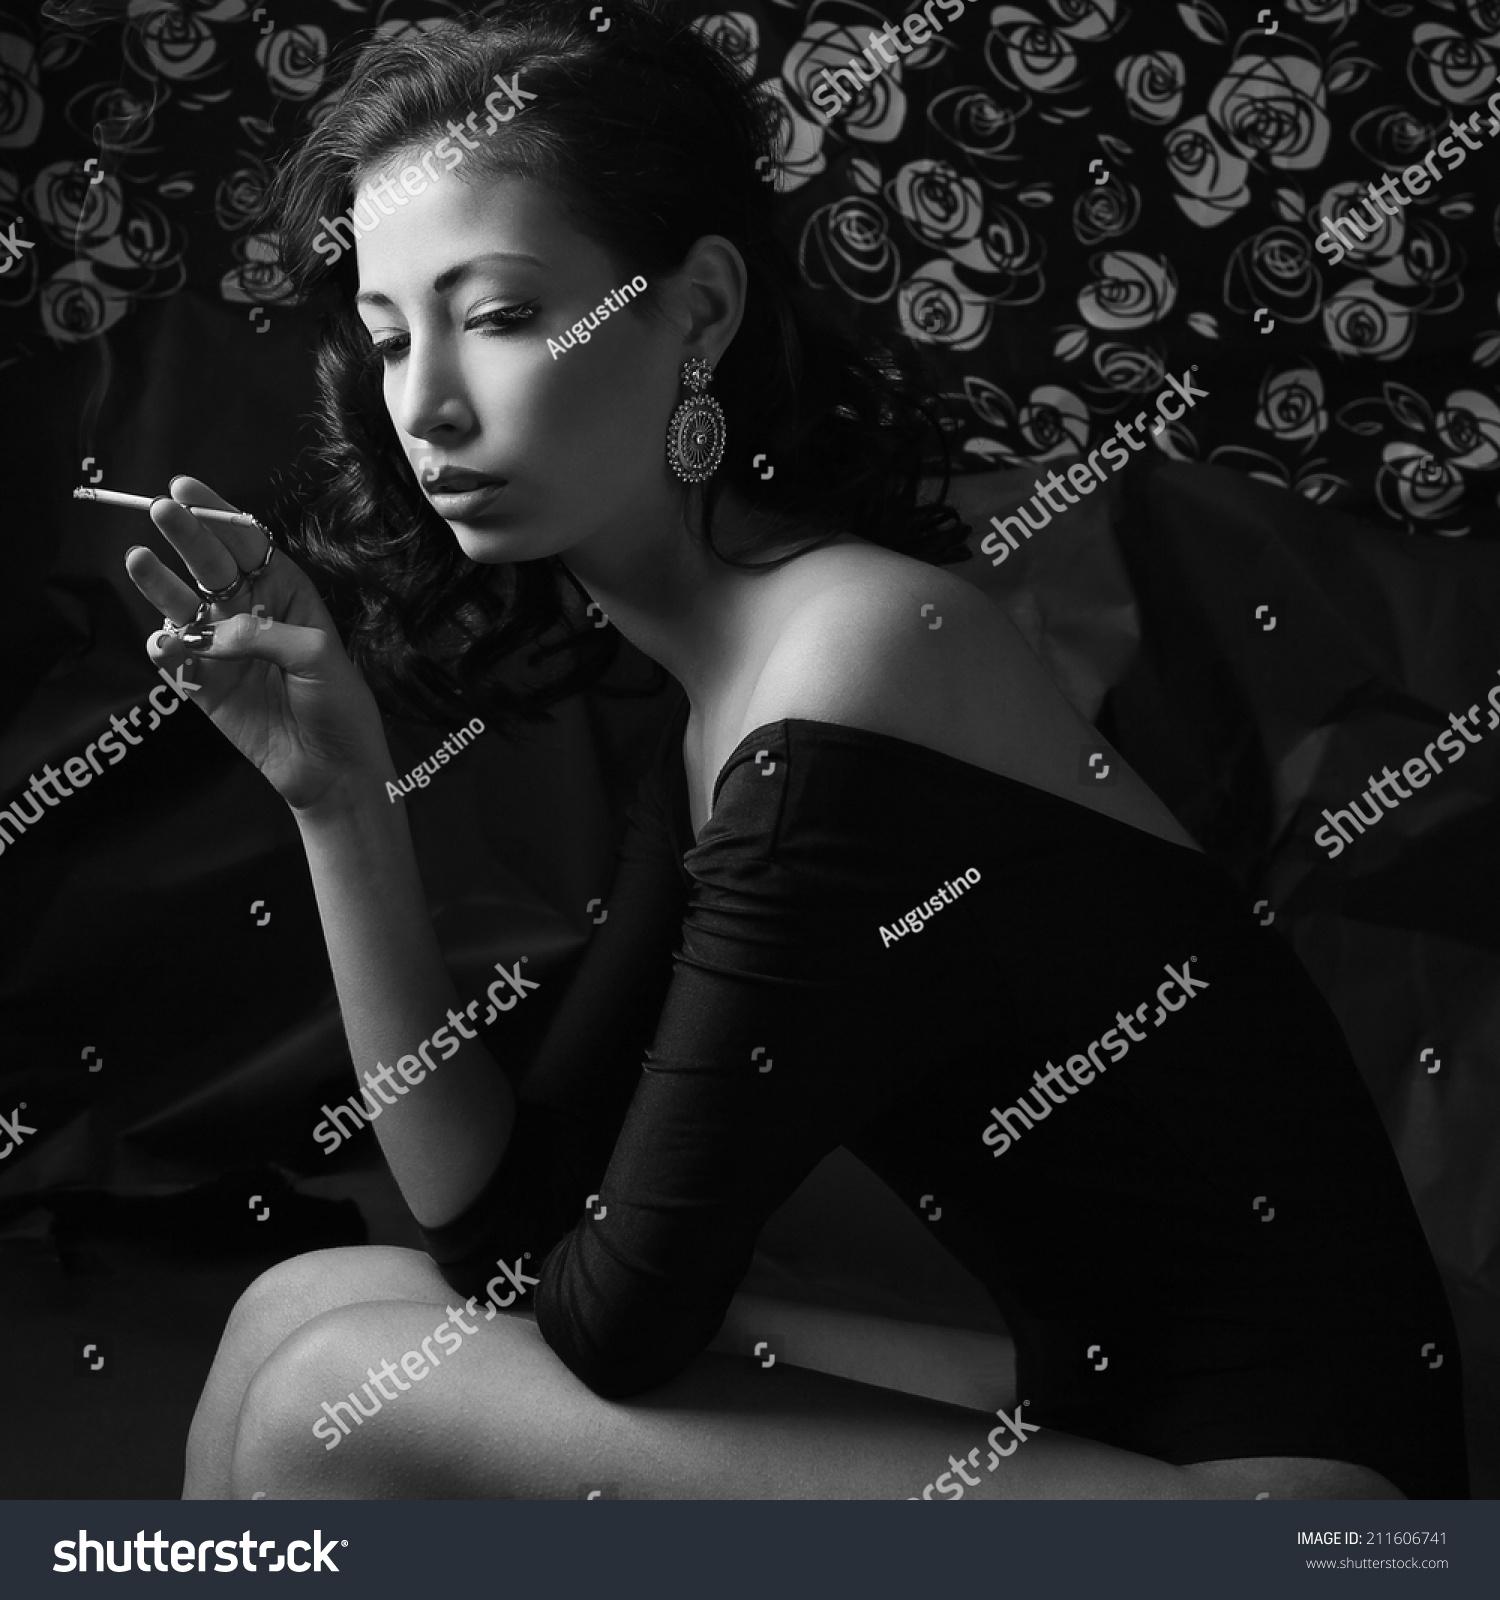 Femme Fatale Hollywood Diva Concept Emotive Stockfoto (Lizenzfrei ...